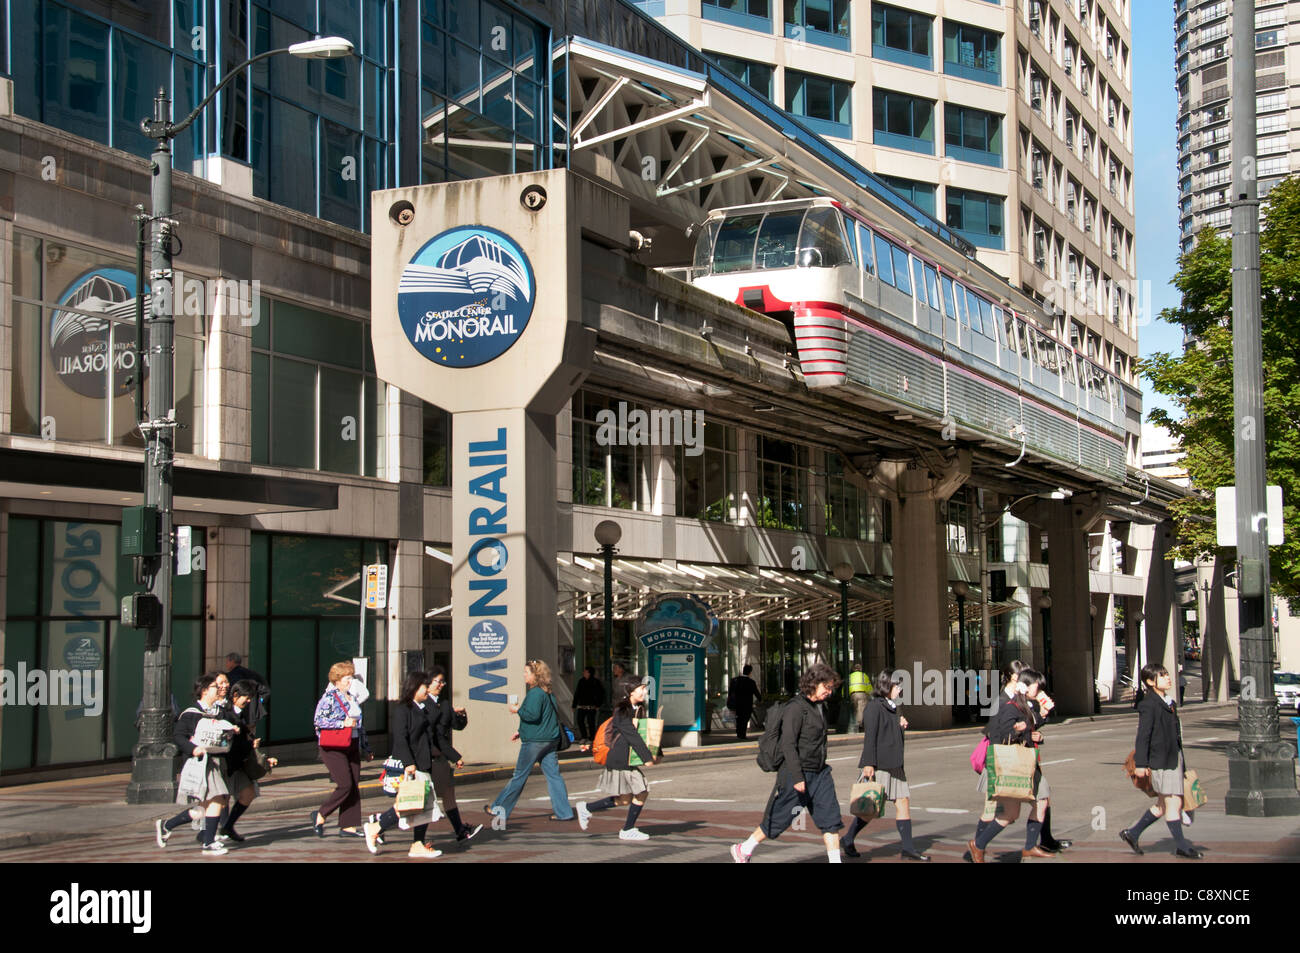 Monorail Seattle City Washington State United States - Stock Image